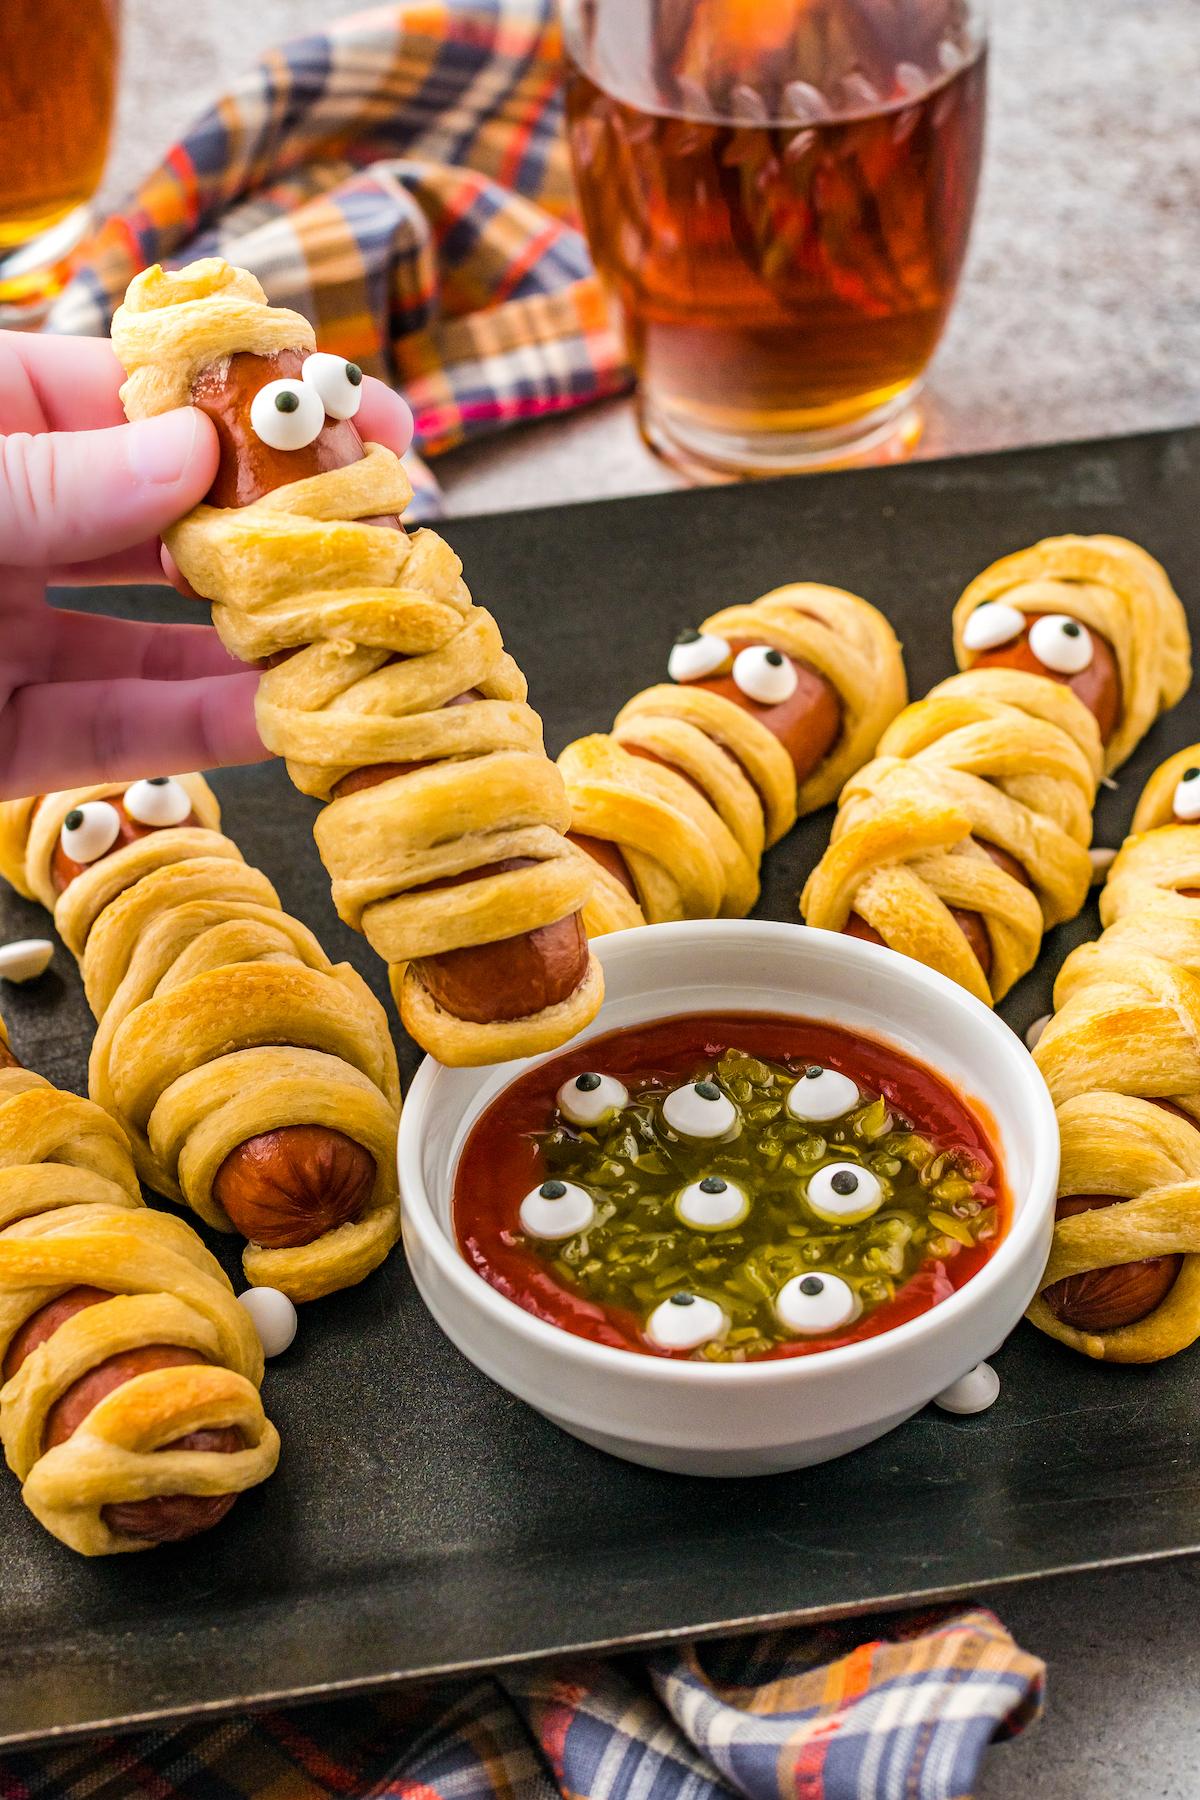 A crescent-dough-wrapped hot dog.